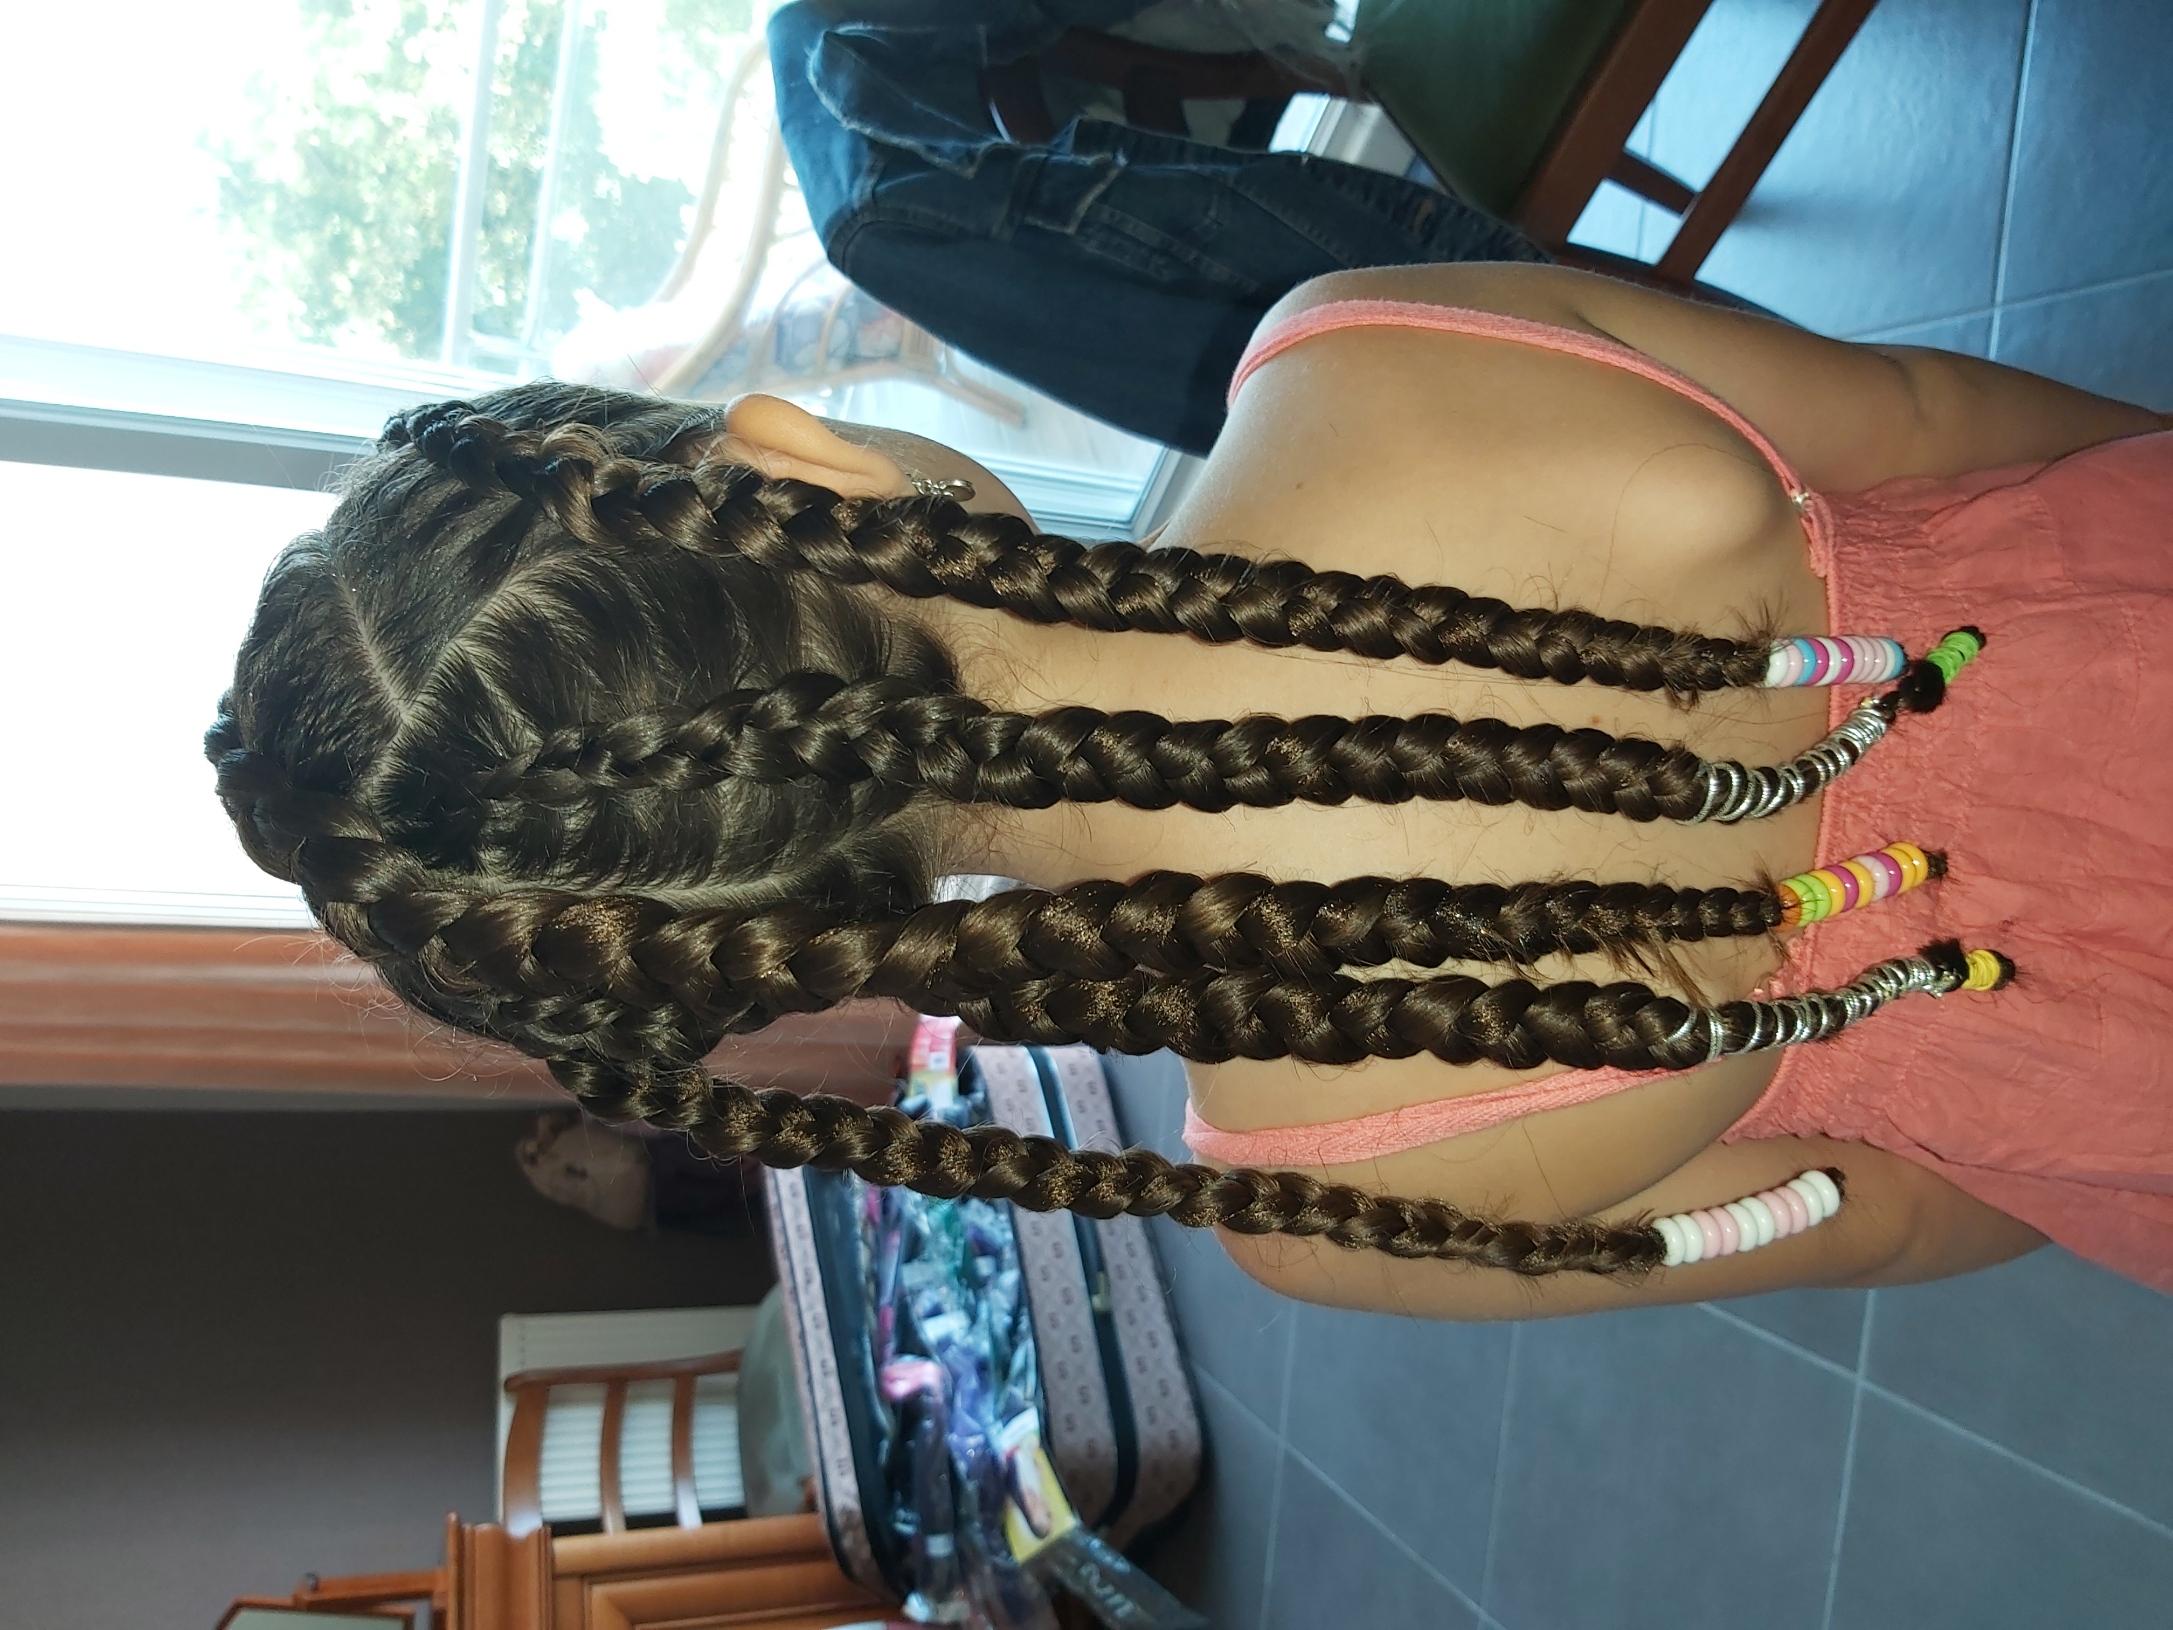 salon de coiffure afro tresse tresses box braids crochet braids vanilles tissages paris 75 77 78 91 92 93 94 95 RWEGRUWP